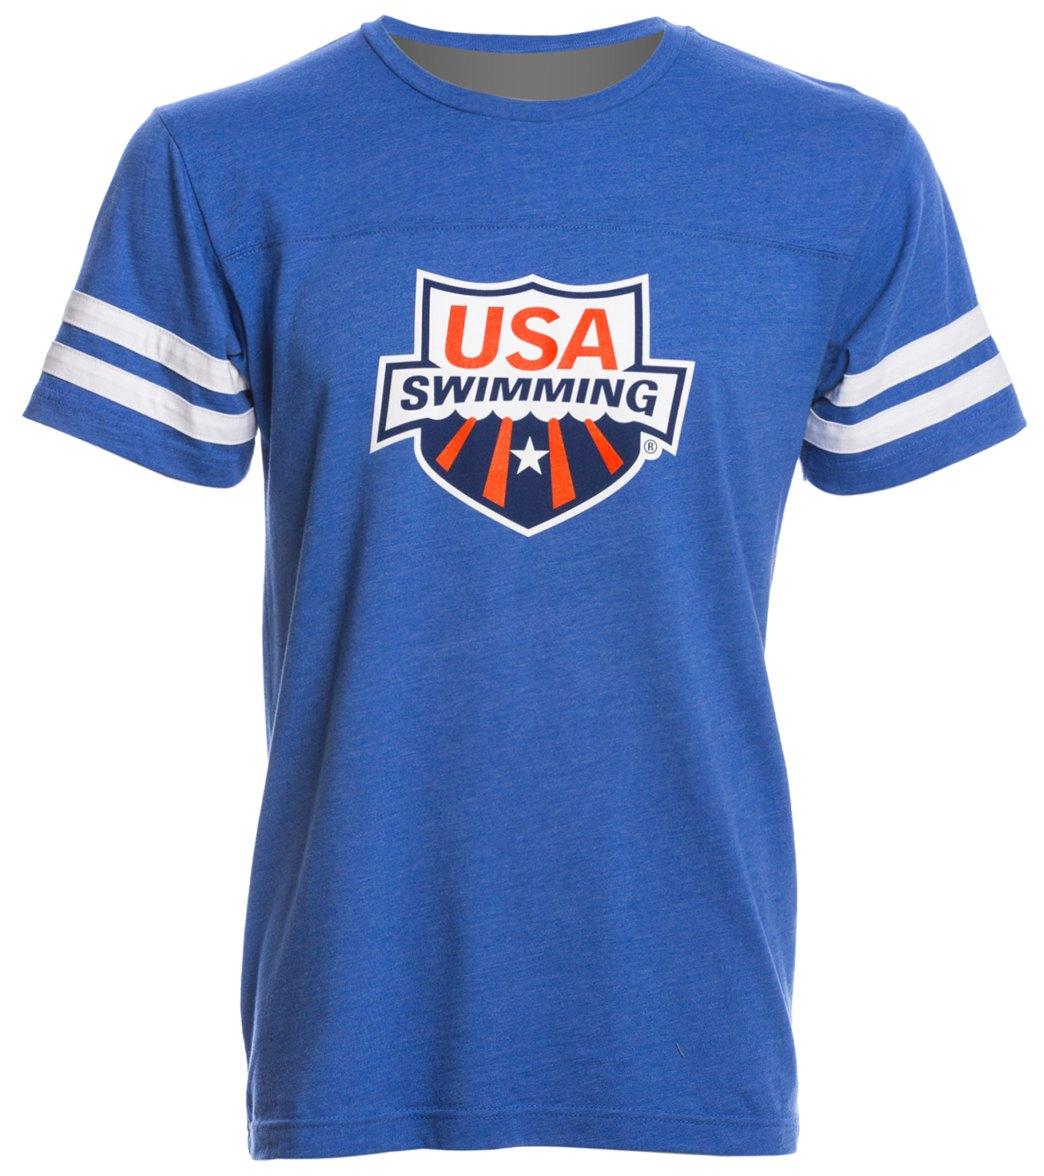 swims shirts usa swimming unisex swimmer jersey t-shirt BZWMHVD